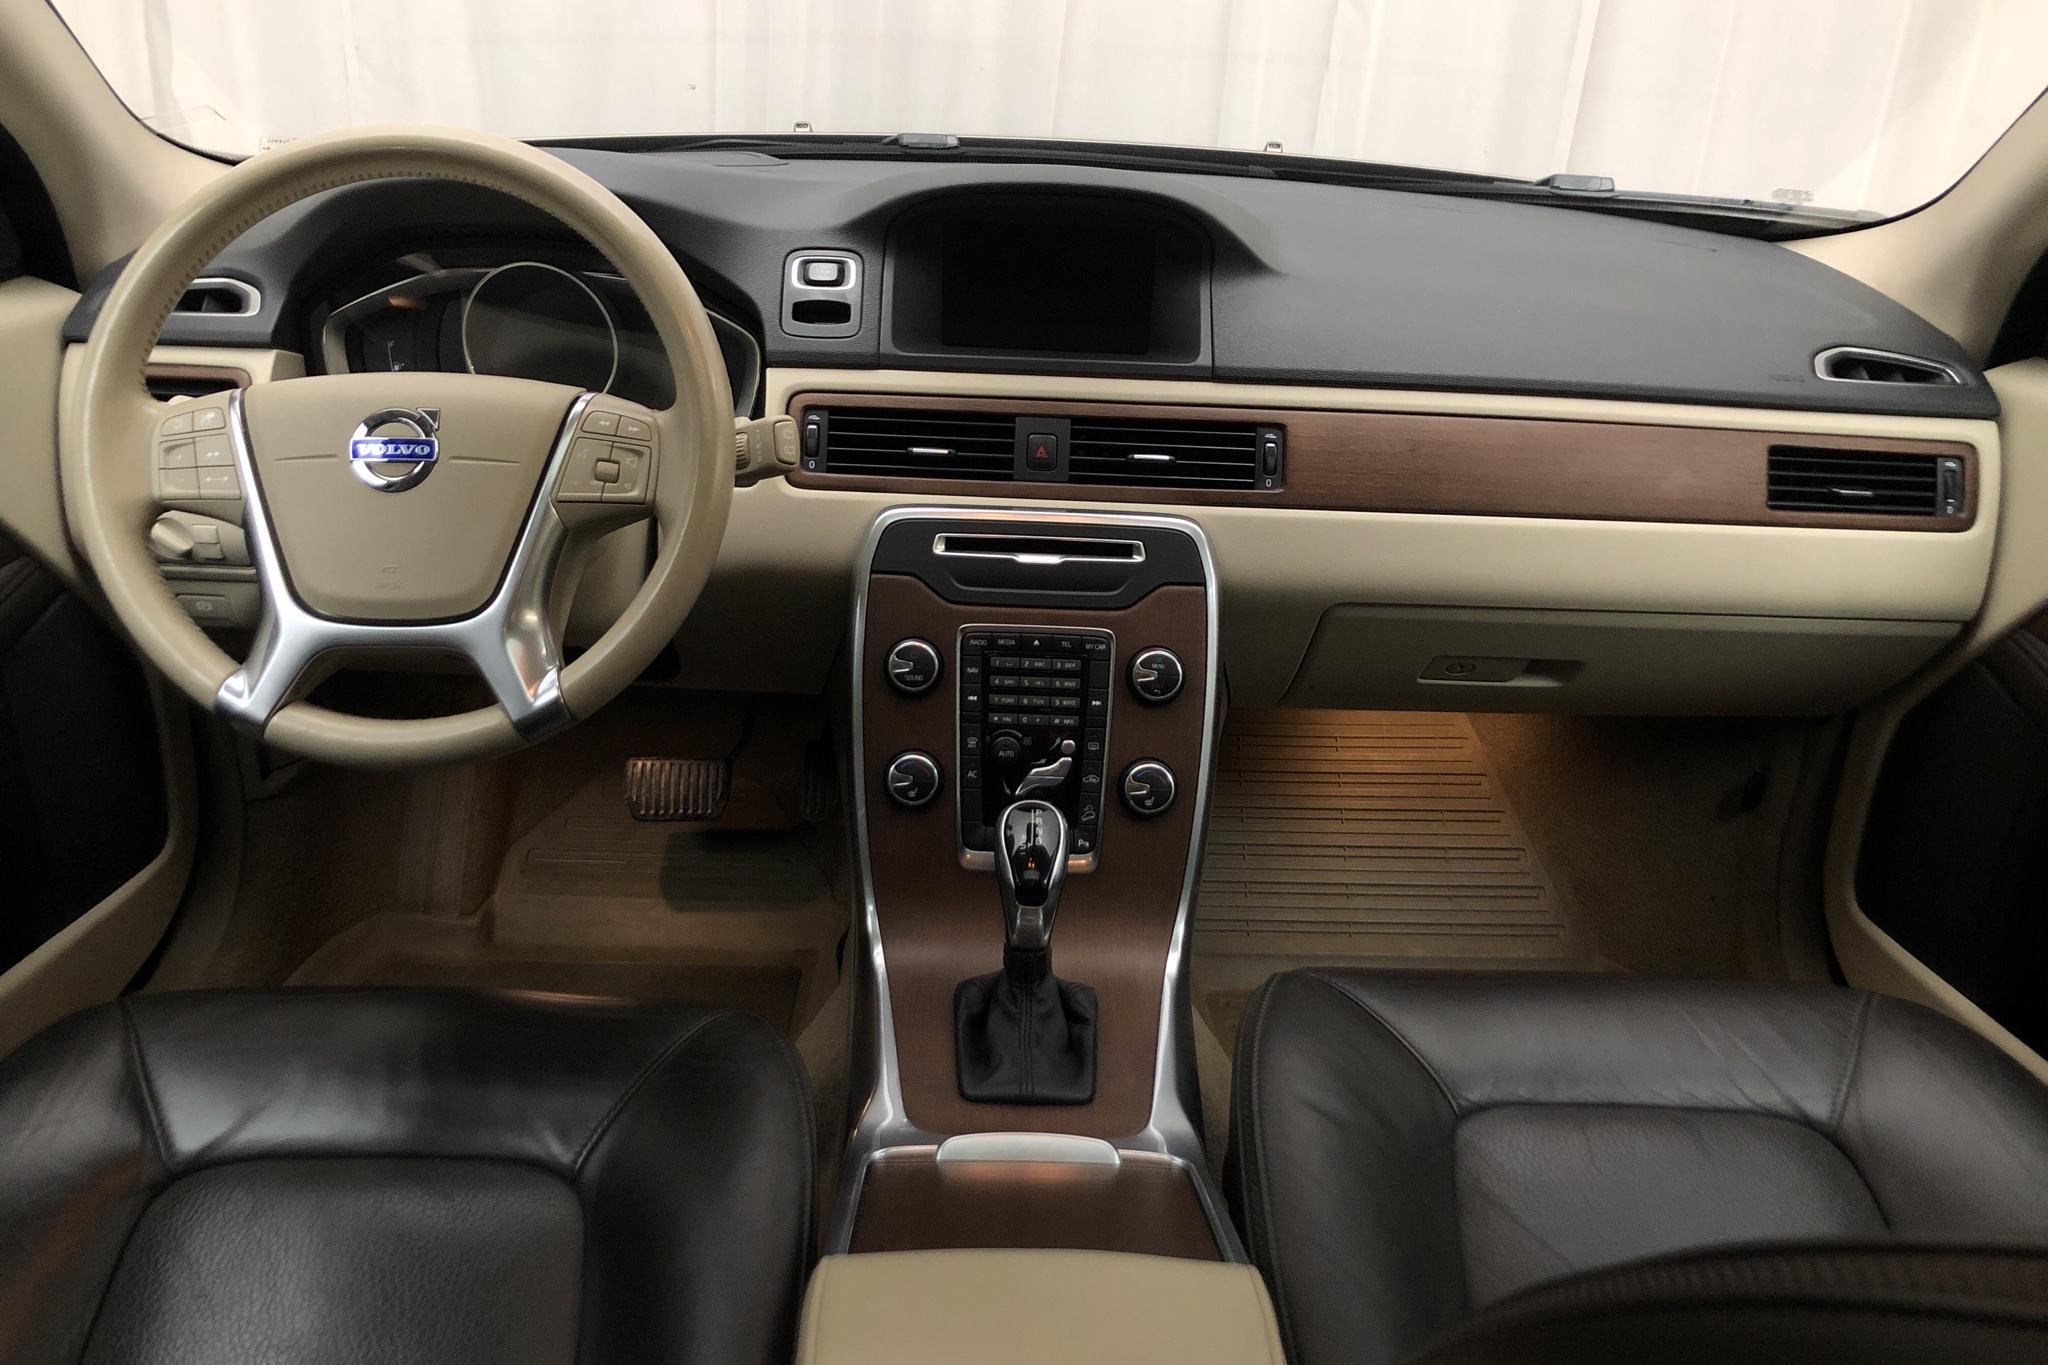 Volvo XC70 II D4 AWD (163hk) - 124 330 km - Automatic - brown - 2014